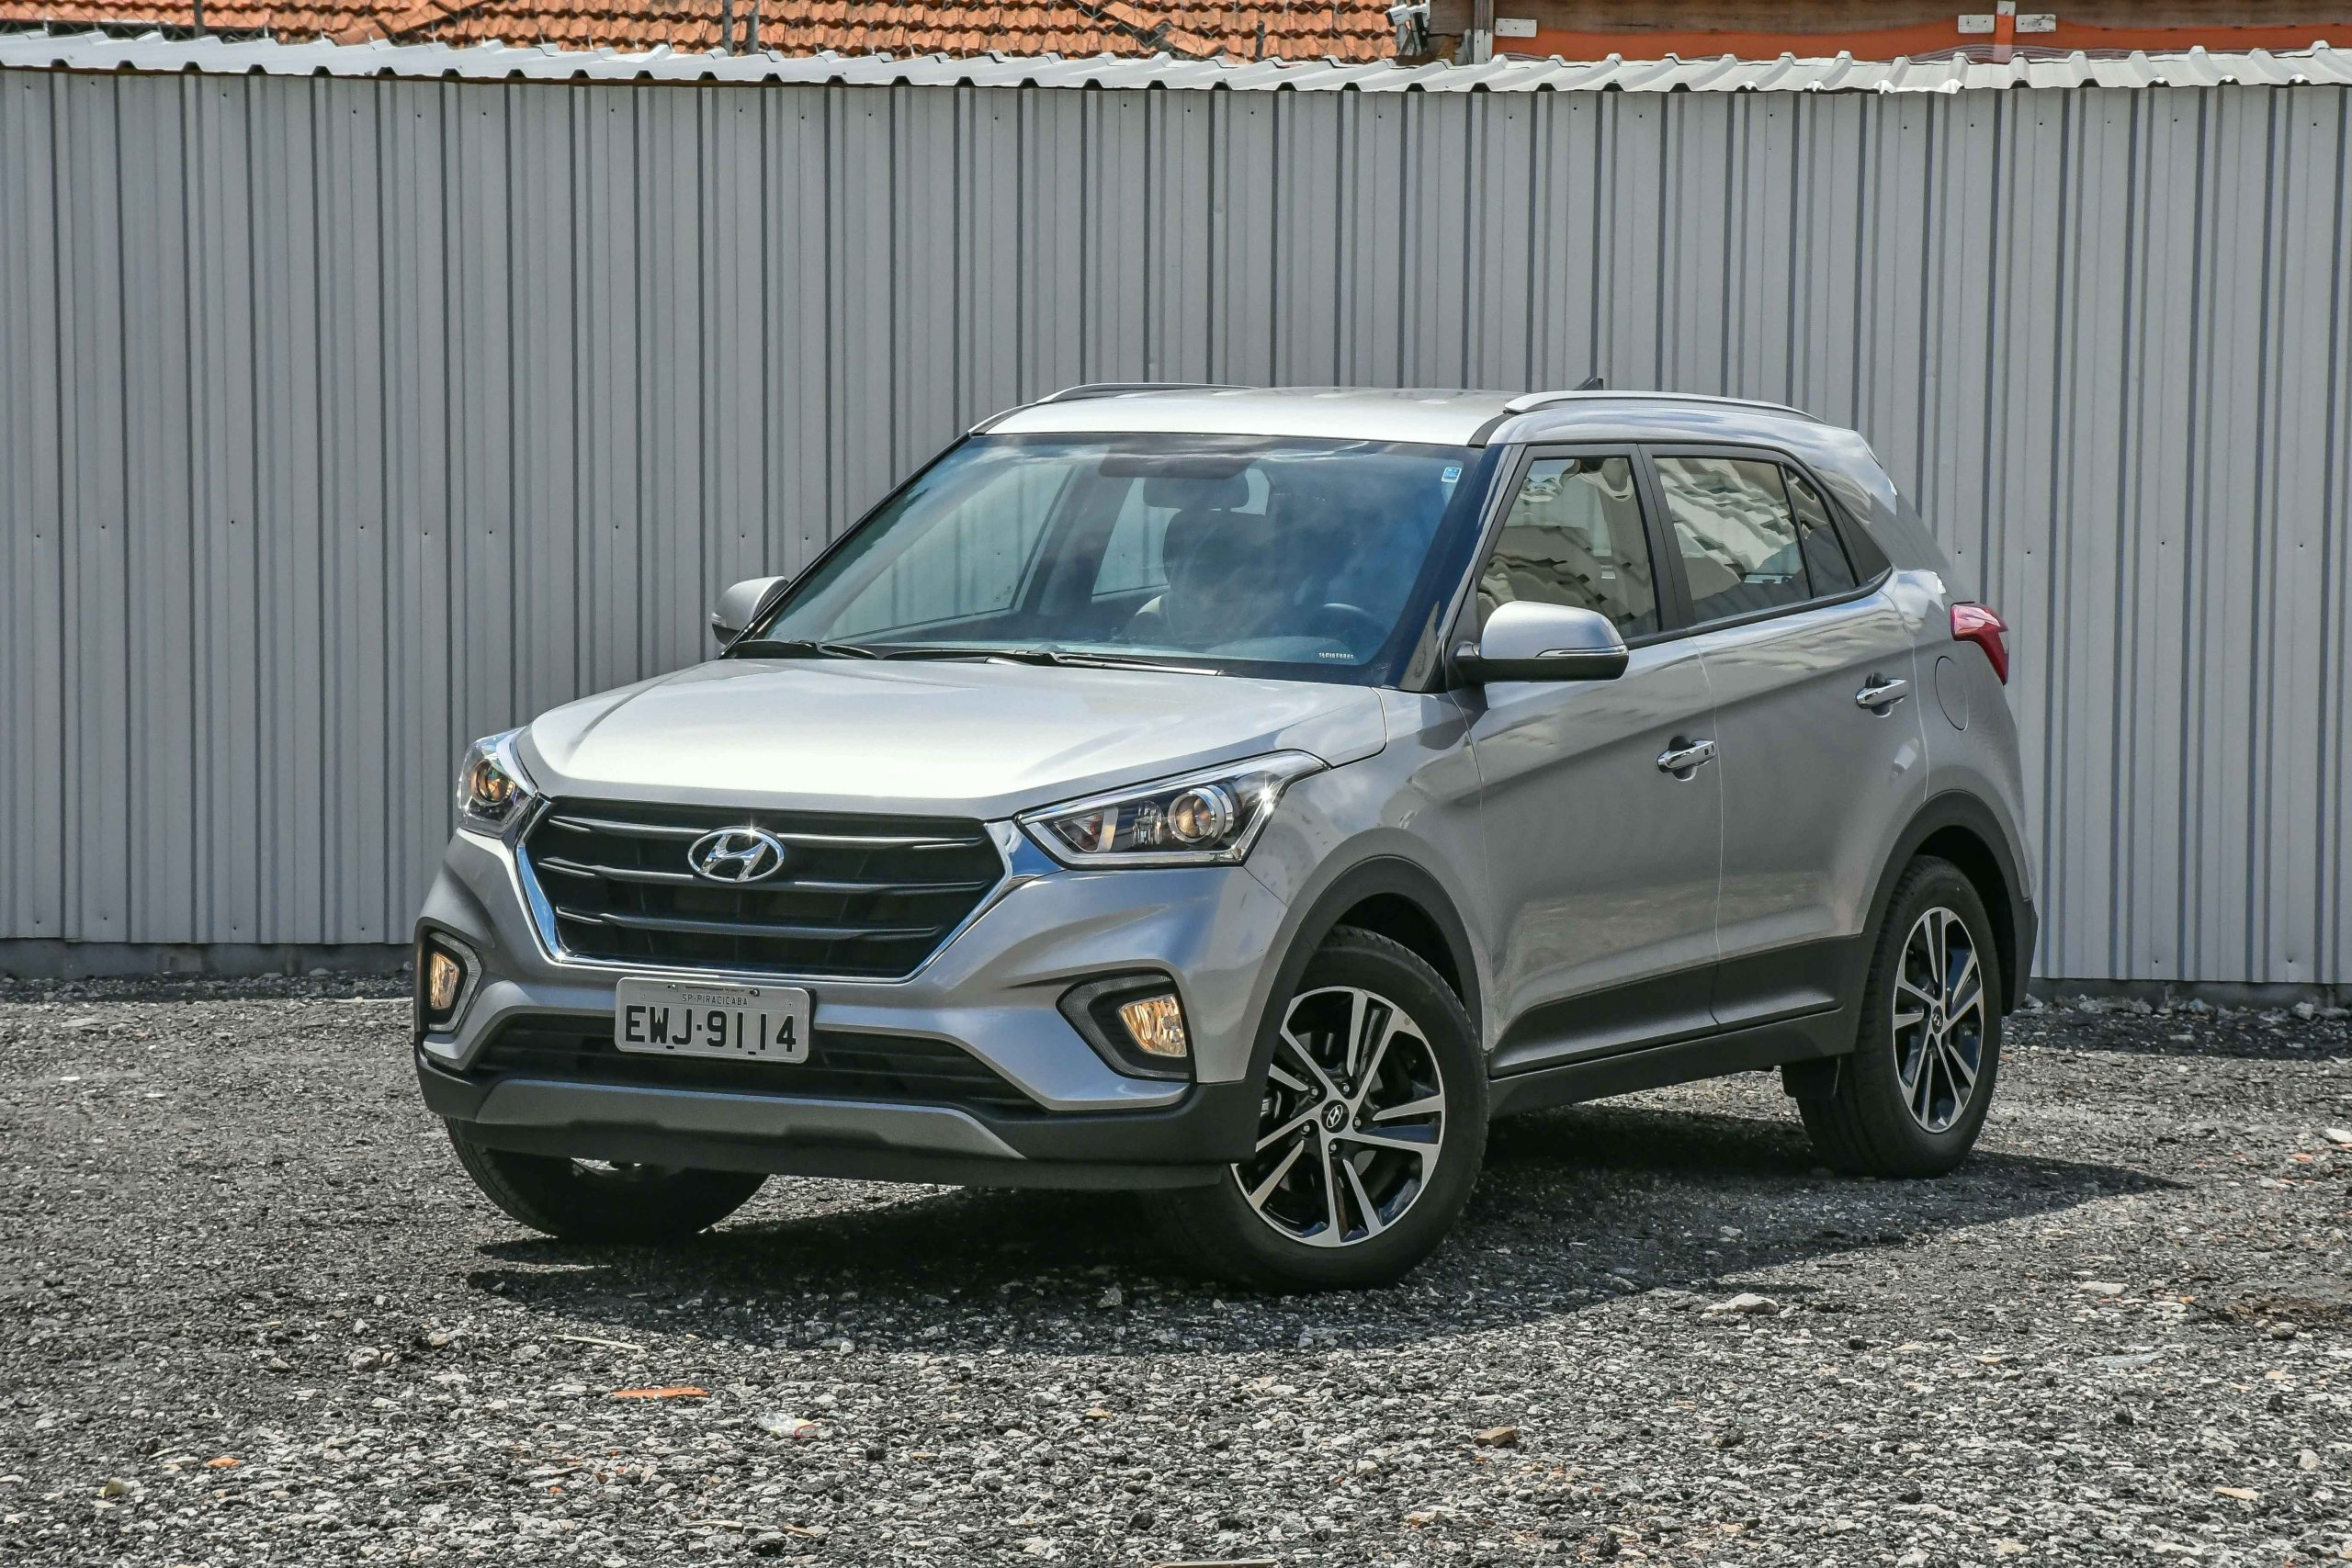 Hyundai Creta 2.0 (8)